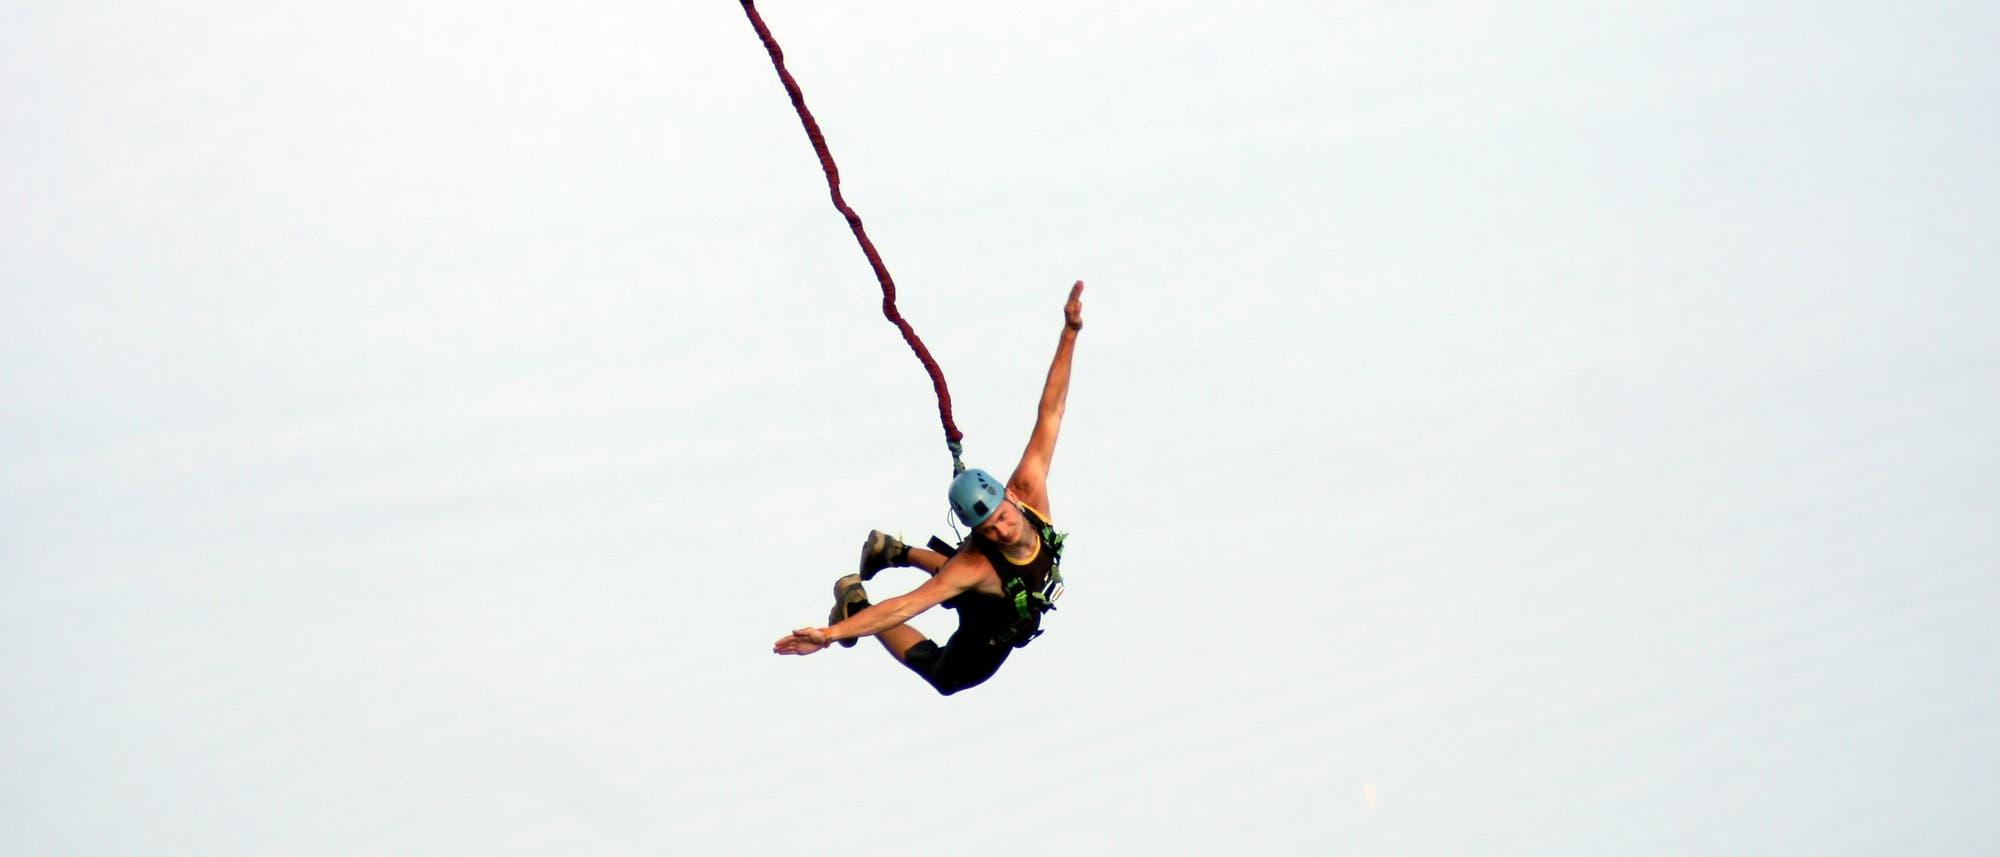 Fallschirmspringer in der Luft